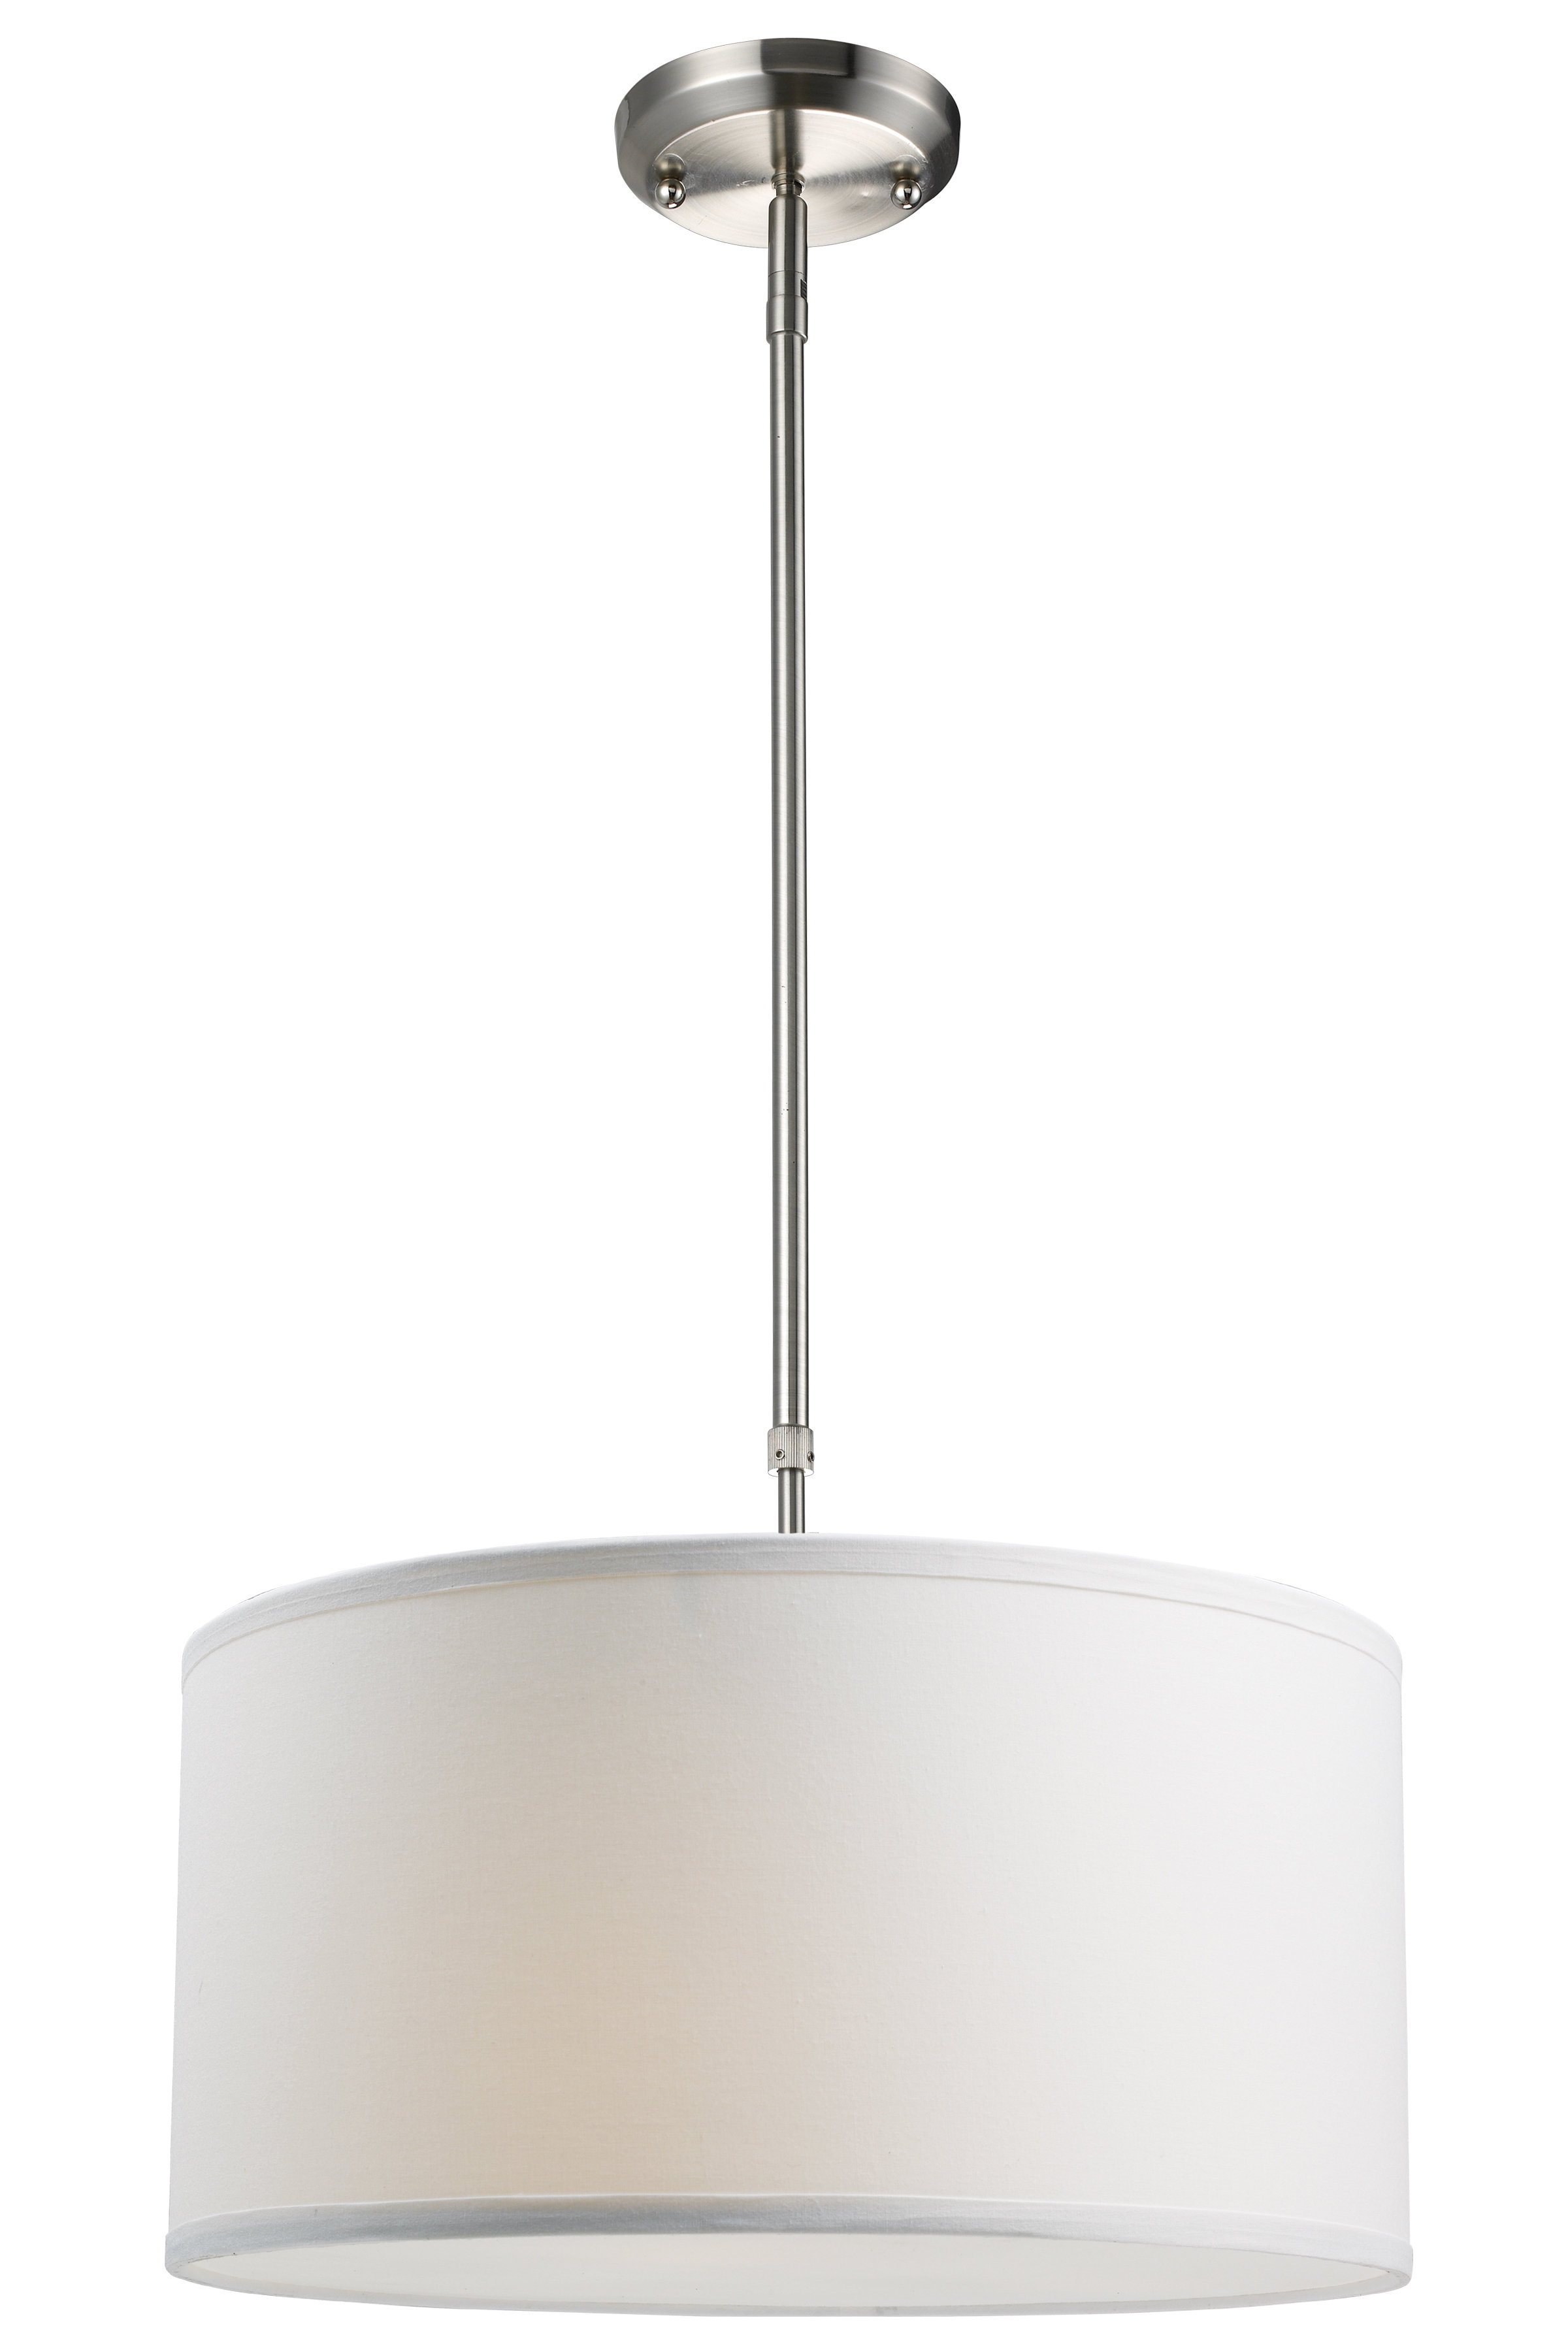 Friedland 3 Light Drum Tiered Pendants Regarding Fashionable Kasey 3 Light Single Drum Pendant (View 5 of 25)